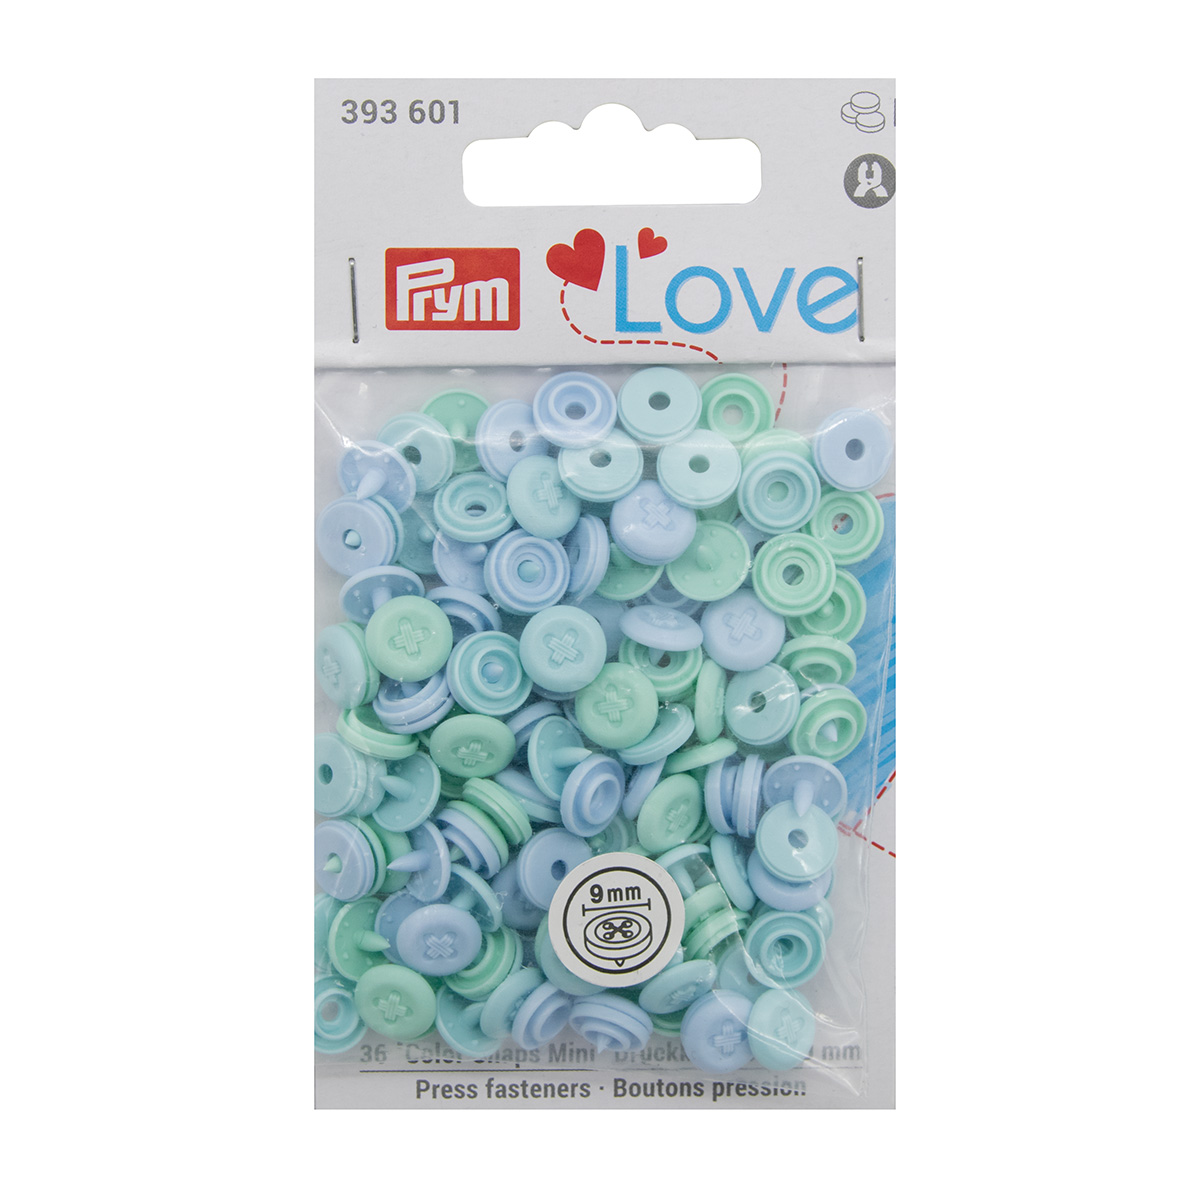 393601 Кнопки ColorSnapsMini имитация стежка Prym Love, голубой 36шт Prym